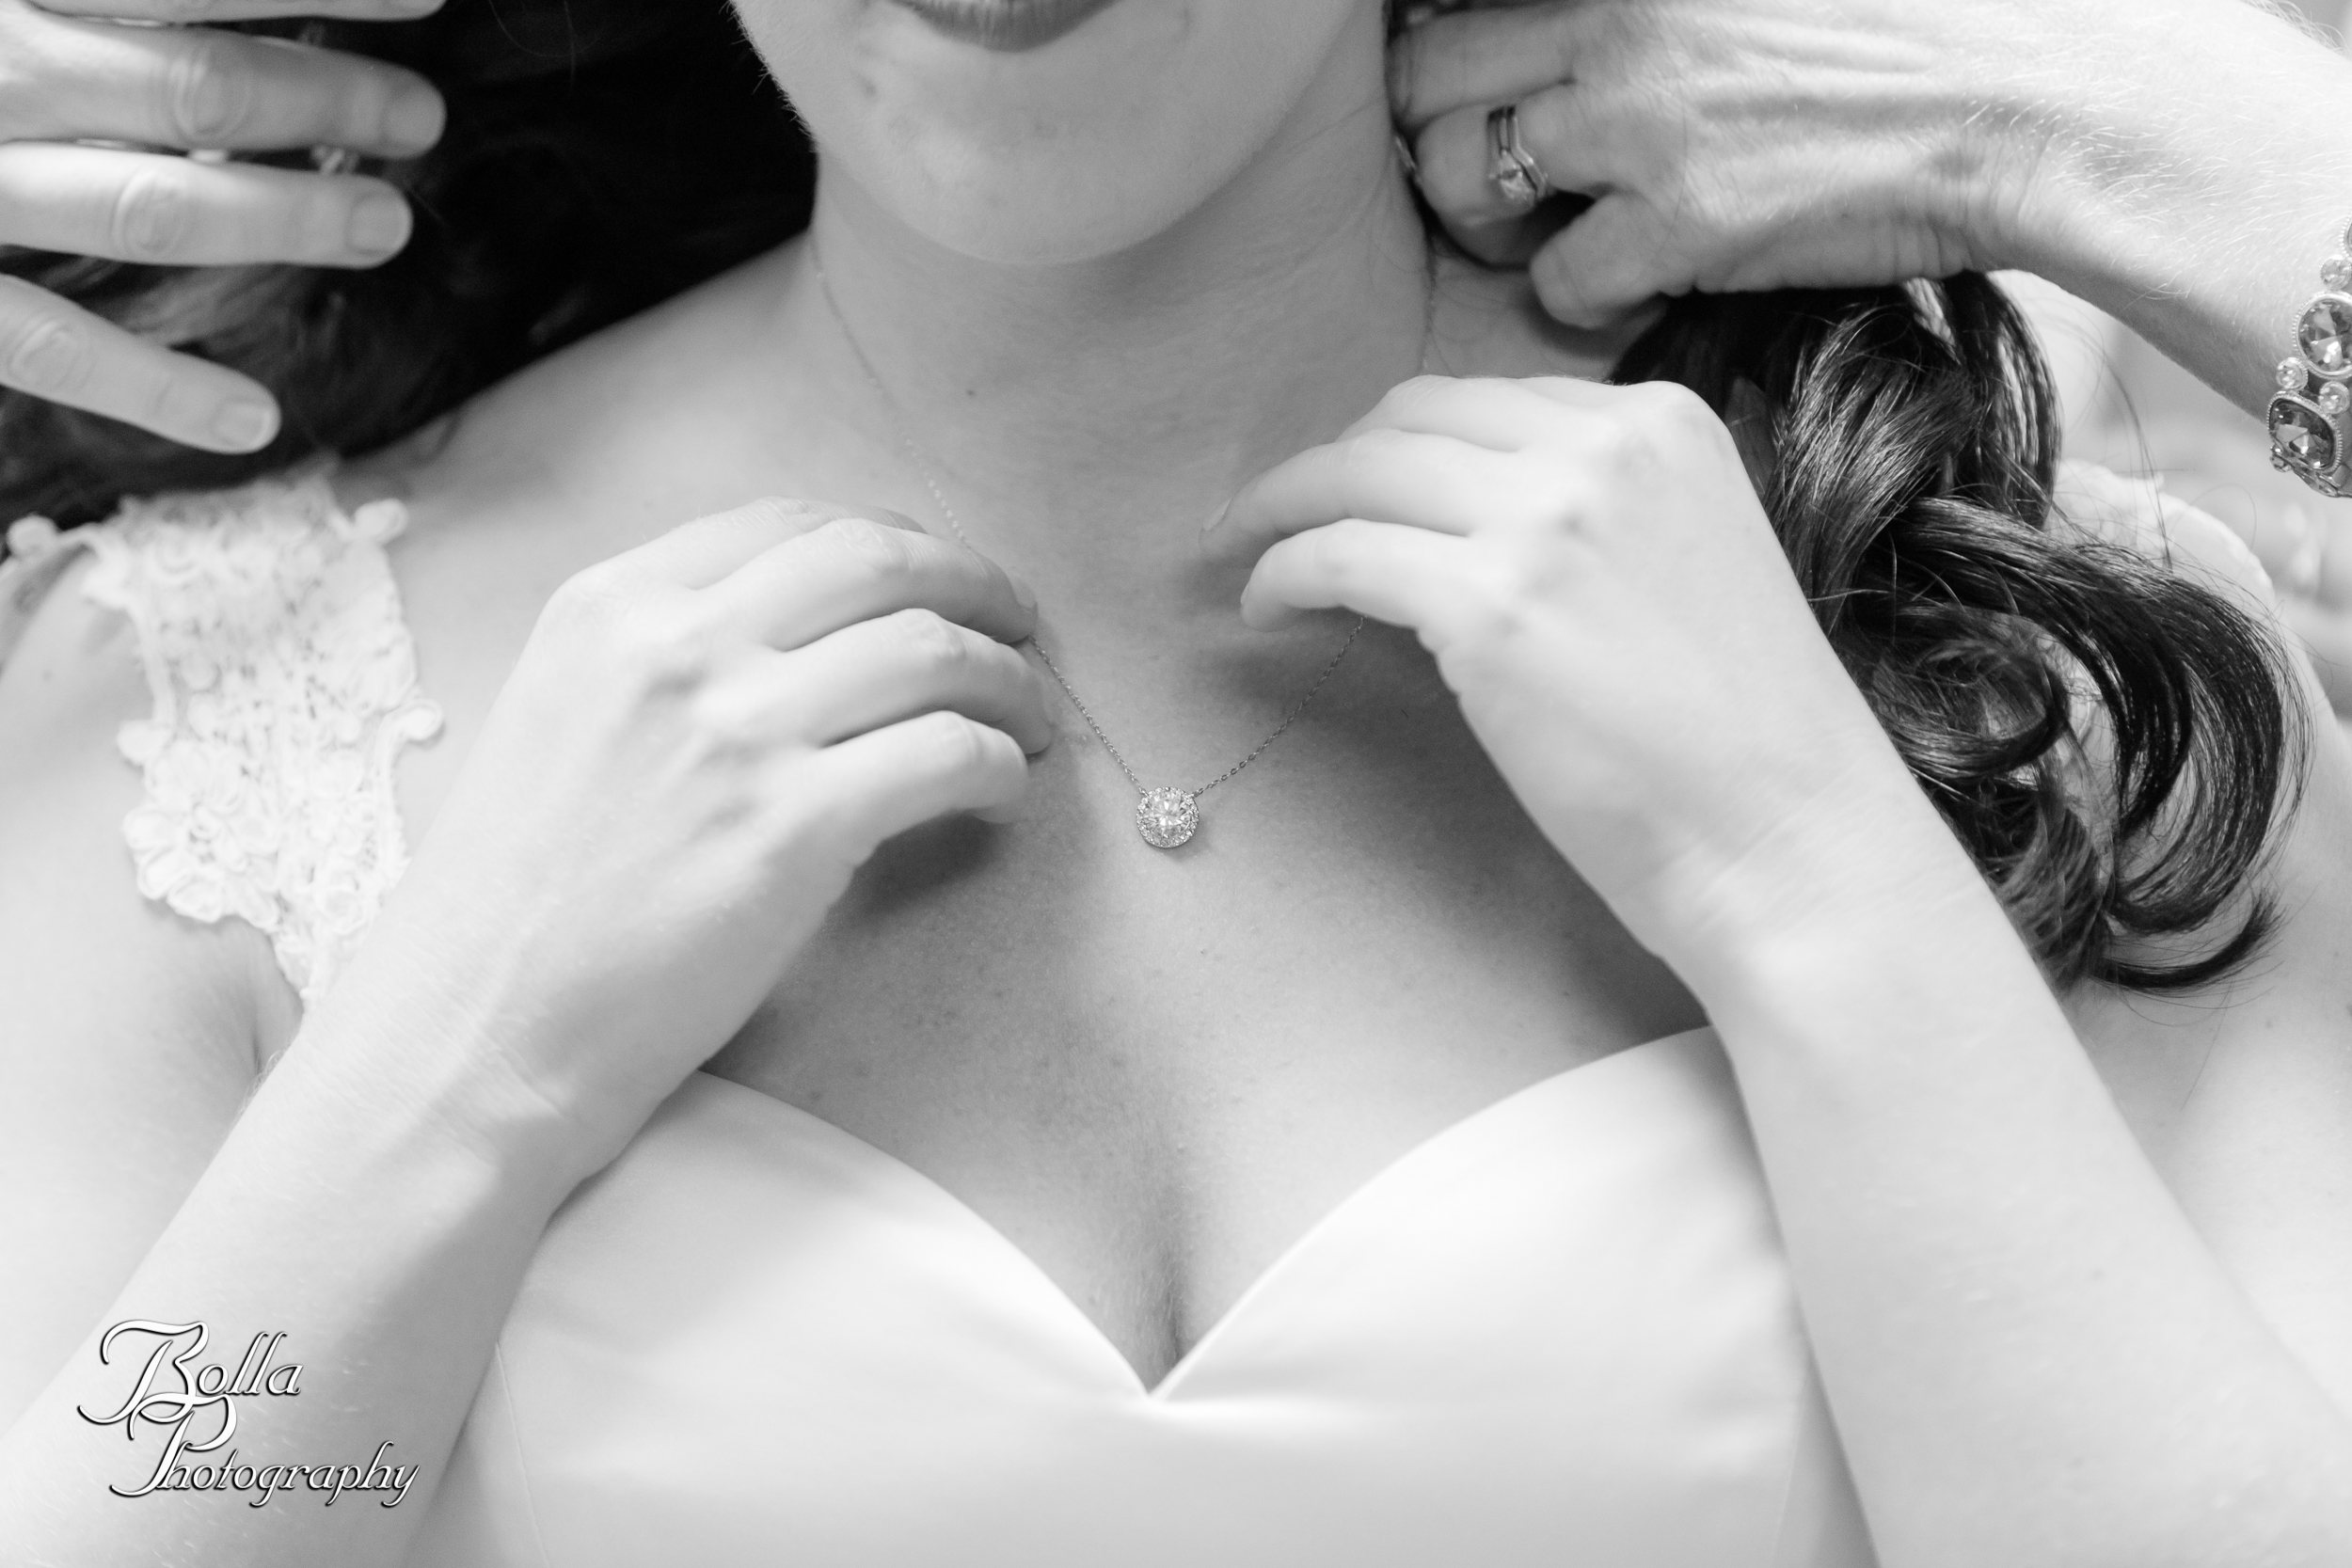 Bolla_photography_edwardsville_wedding_photographer_st_louis_weddings_Reilmann-0067.jpg